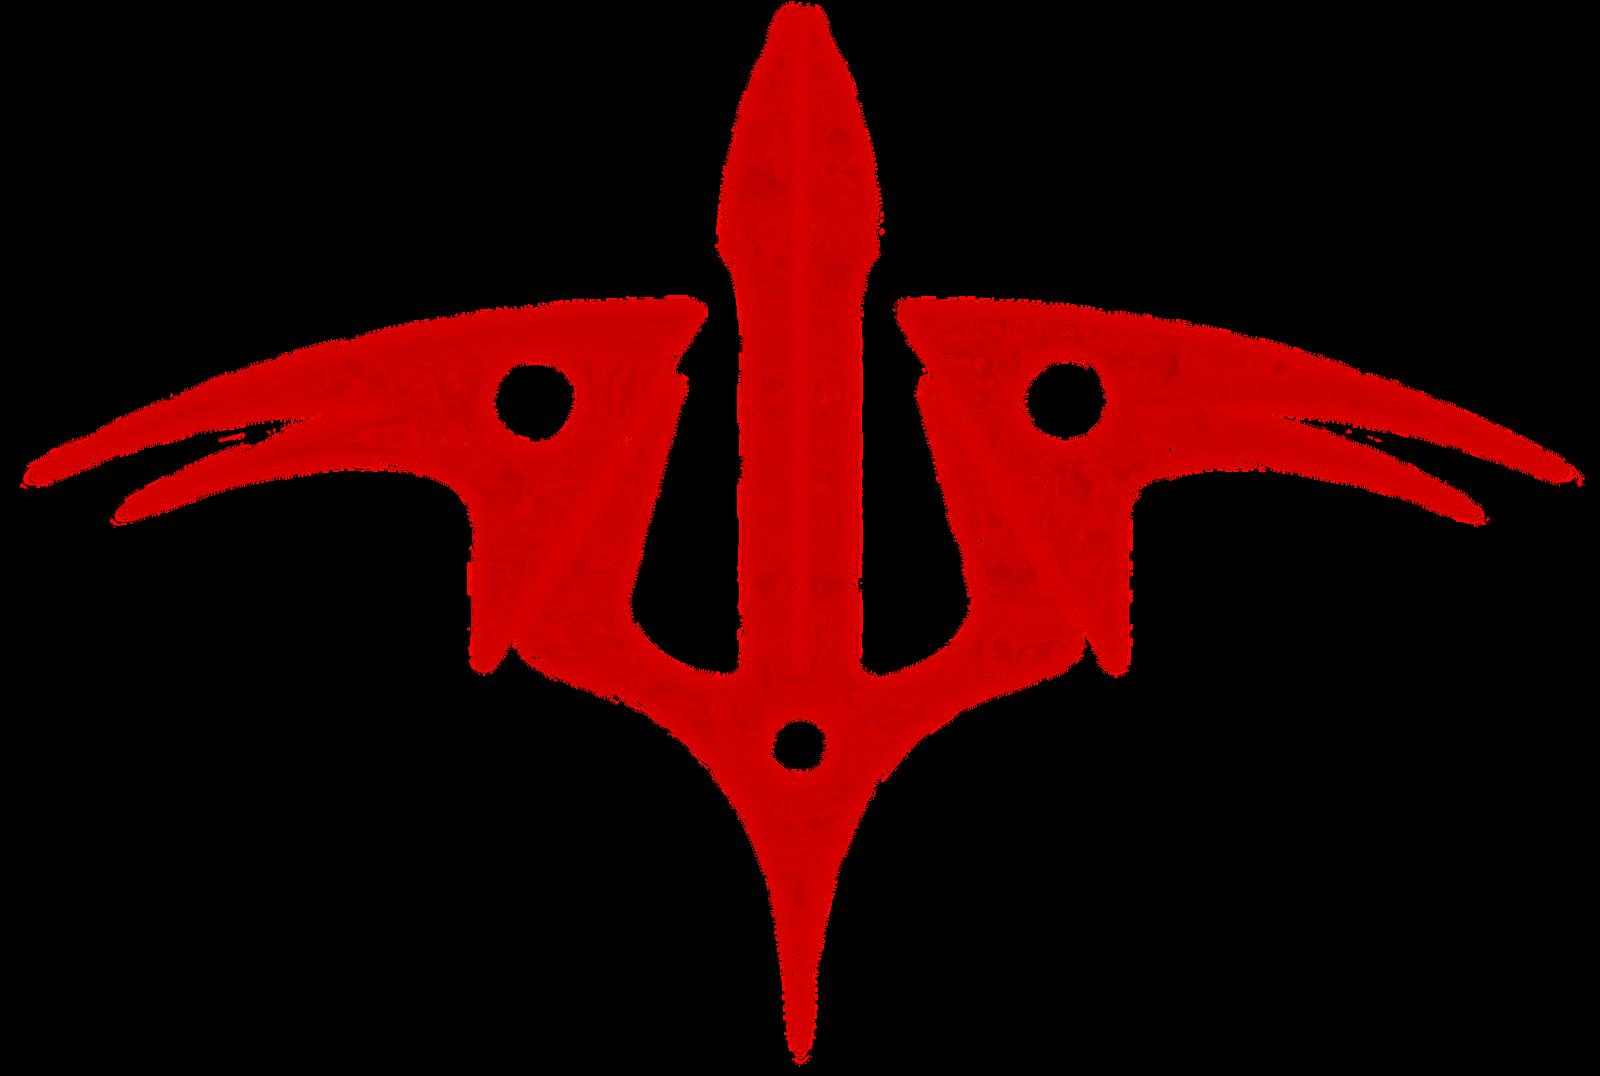 [JOGOBRINCA] Fate/DOPGOTIGOUH Command_spells_by_kriss80858-d71fipz